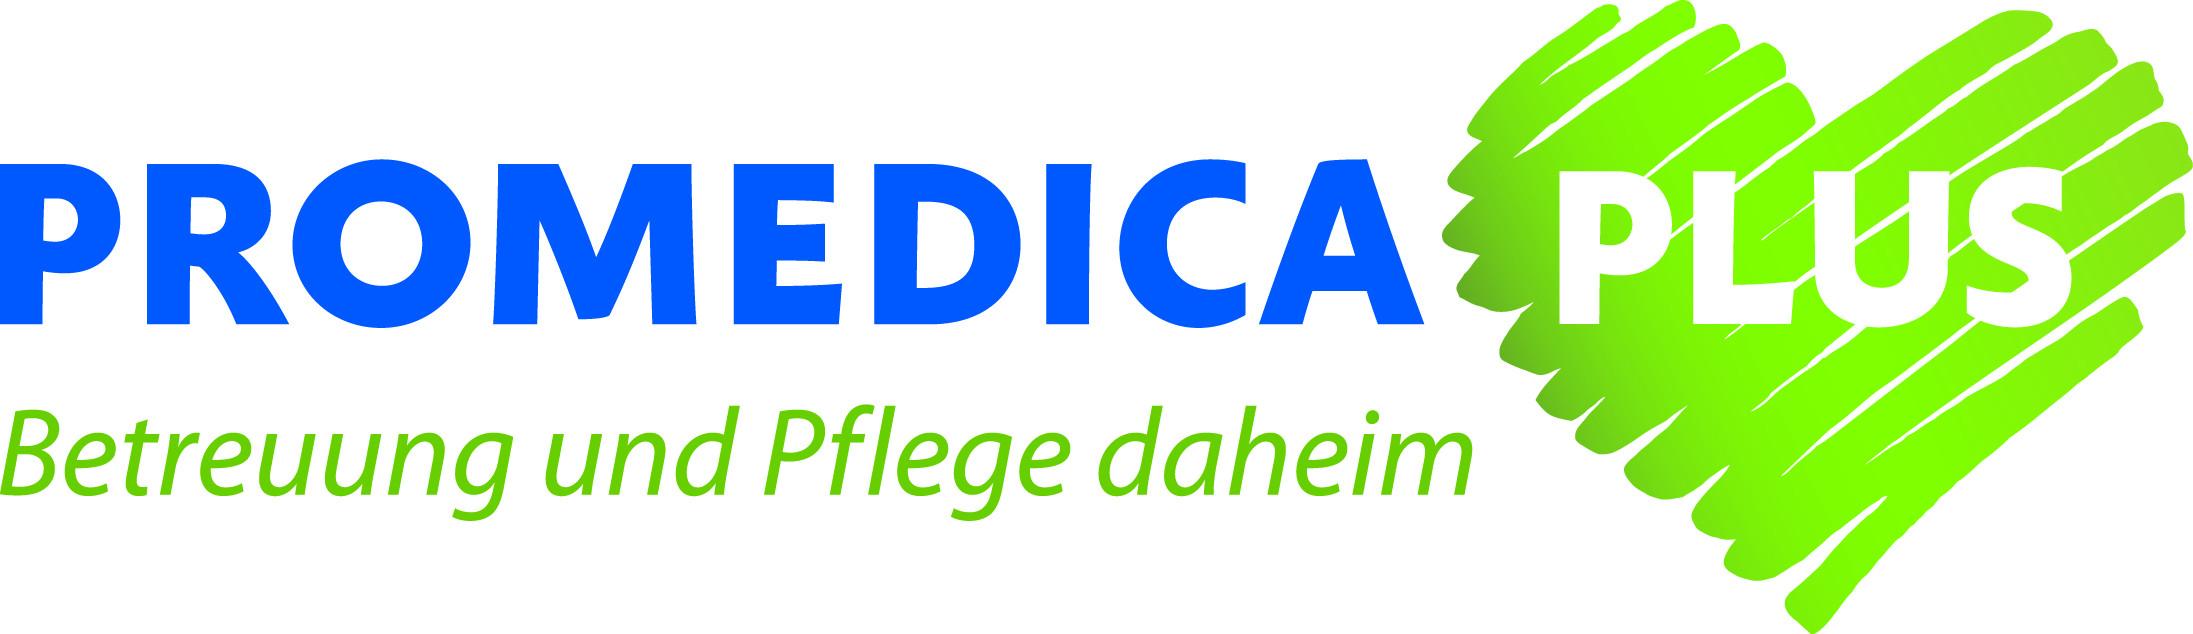 Logo PROMEDICA PLUS Nürnberg Nord